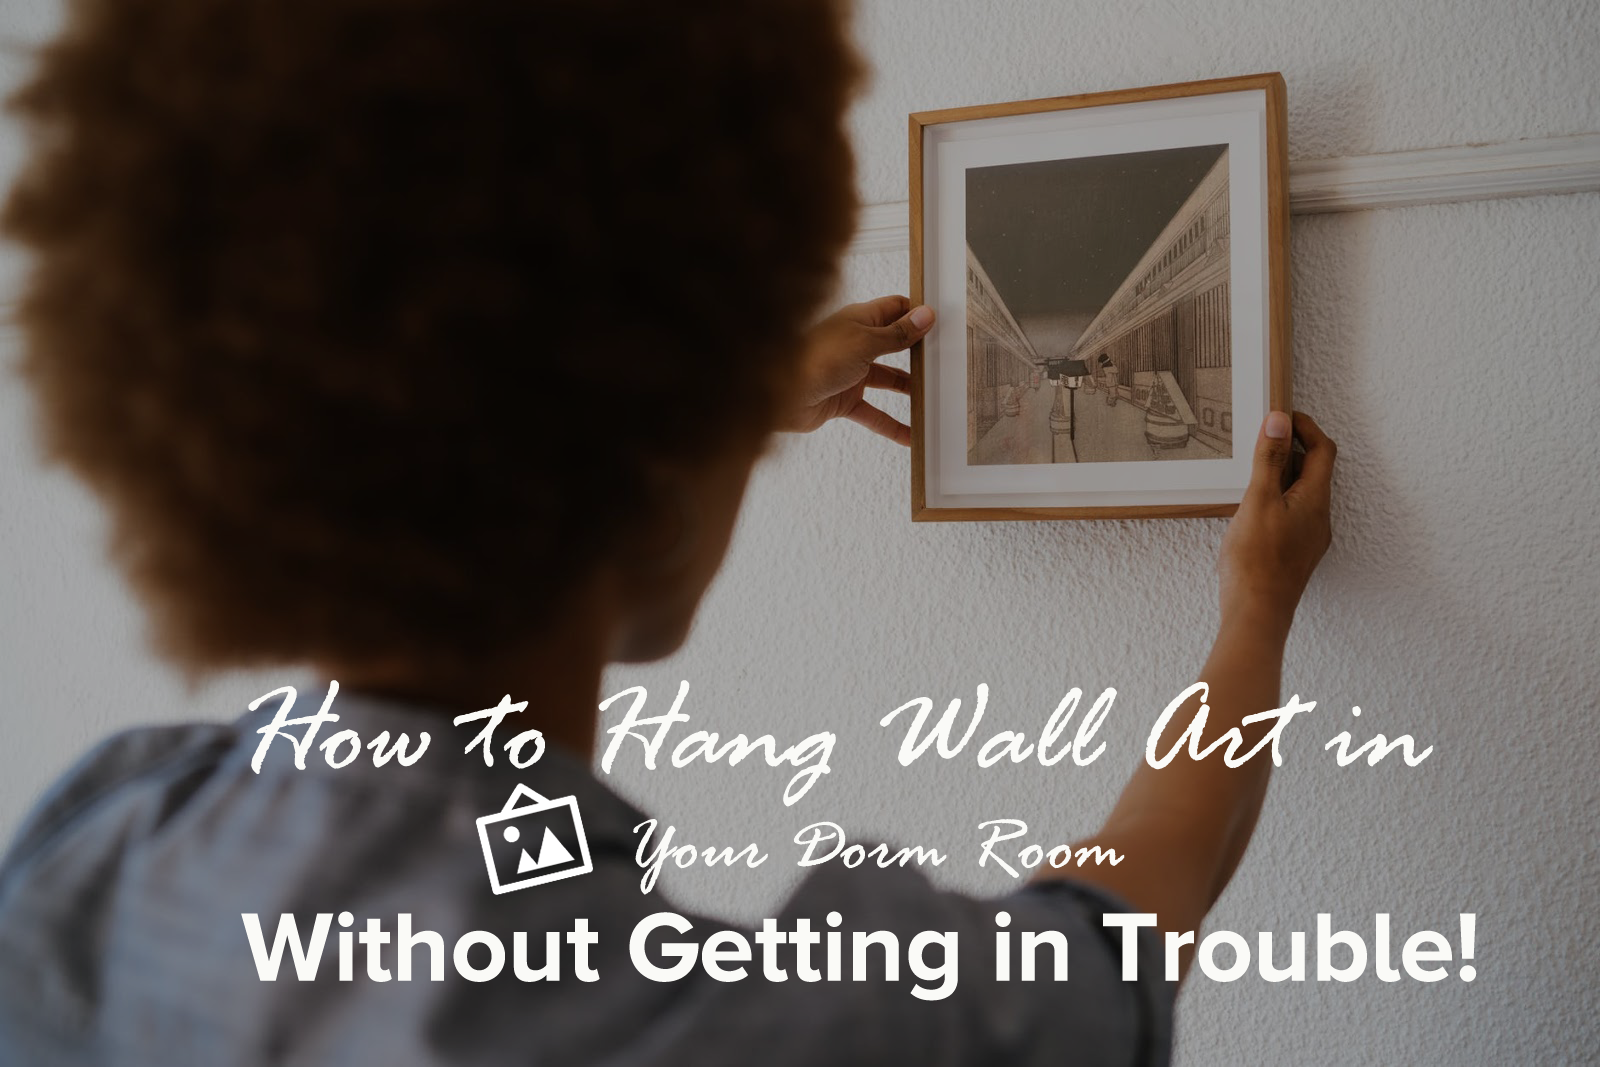 The Best Damage-Free Ways to Make Your Dorm Room Pop